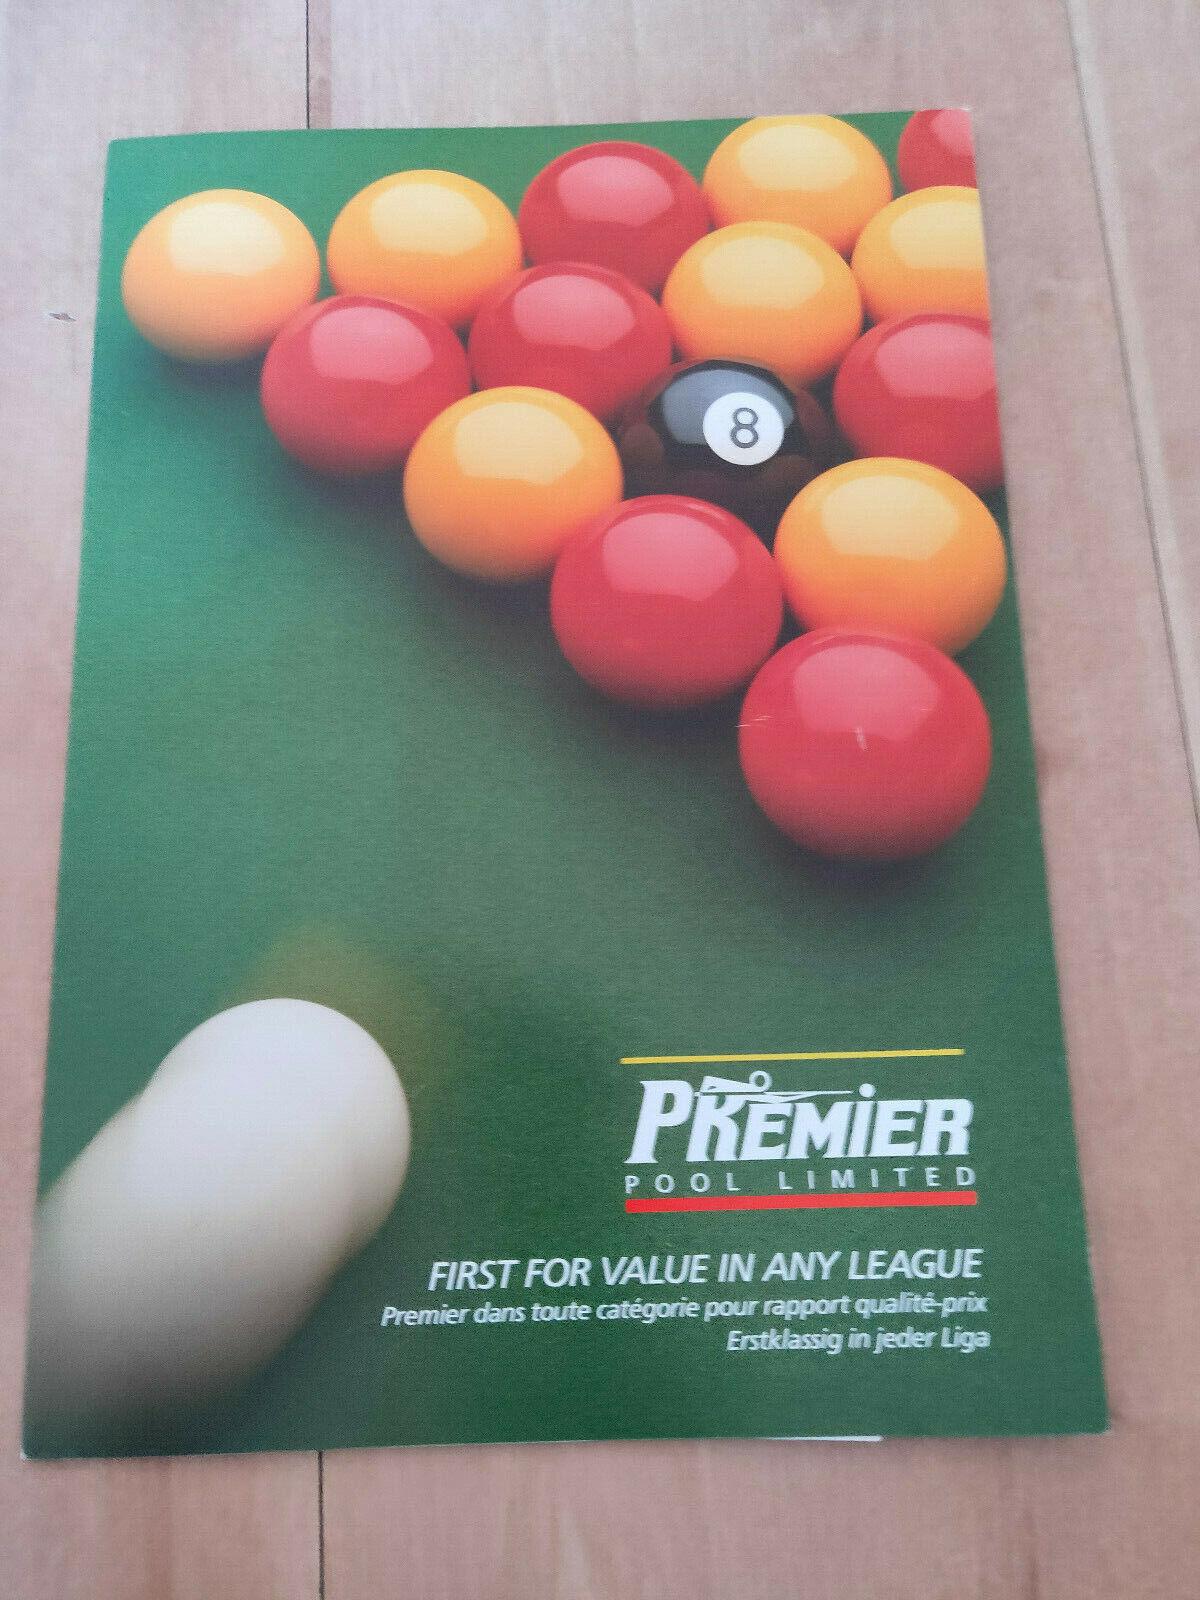 Premier Pool Table Ltd Statesman and Europa Pool Table Sales Catalogue / Brochure